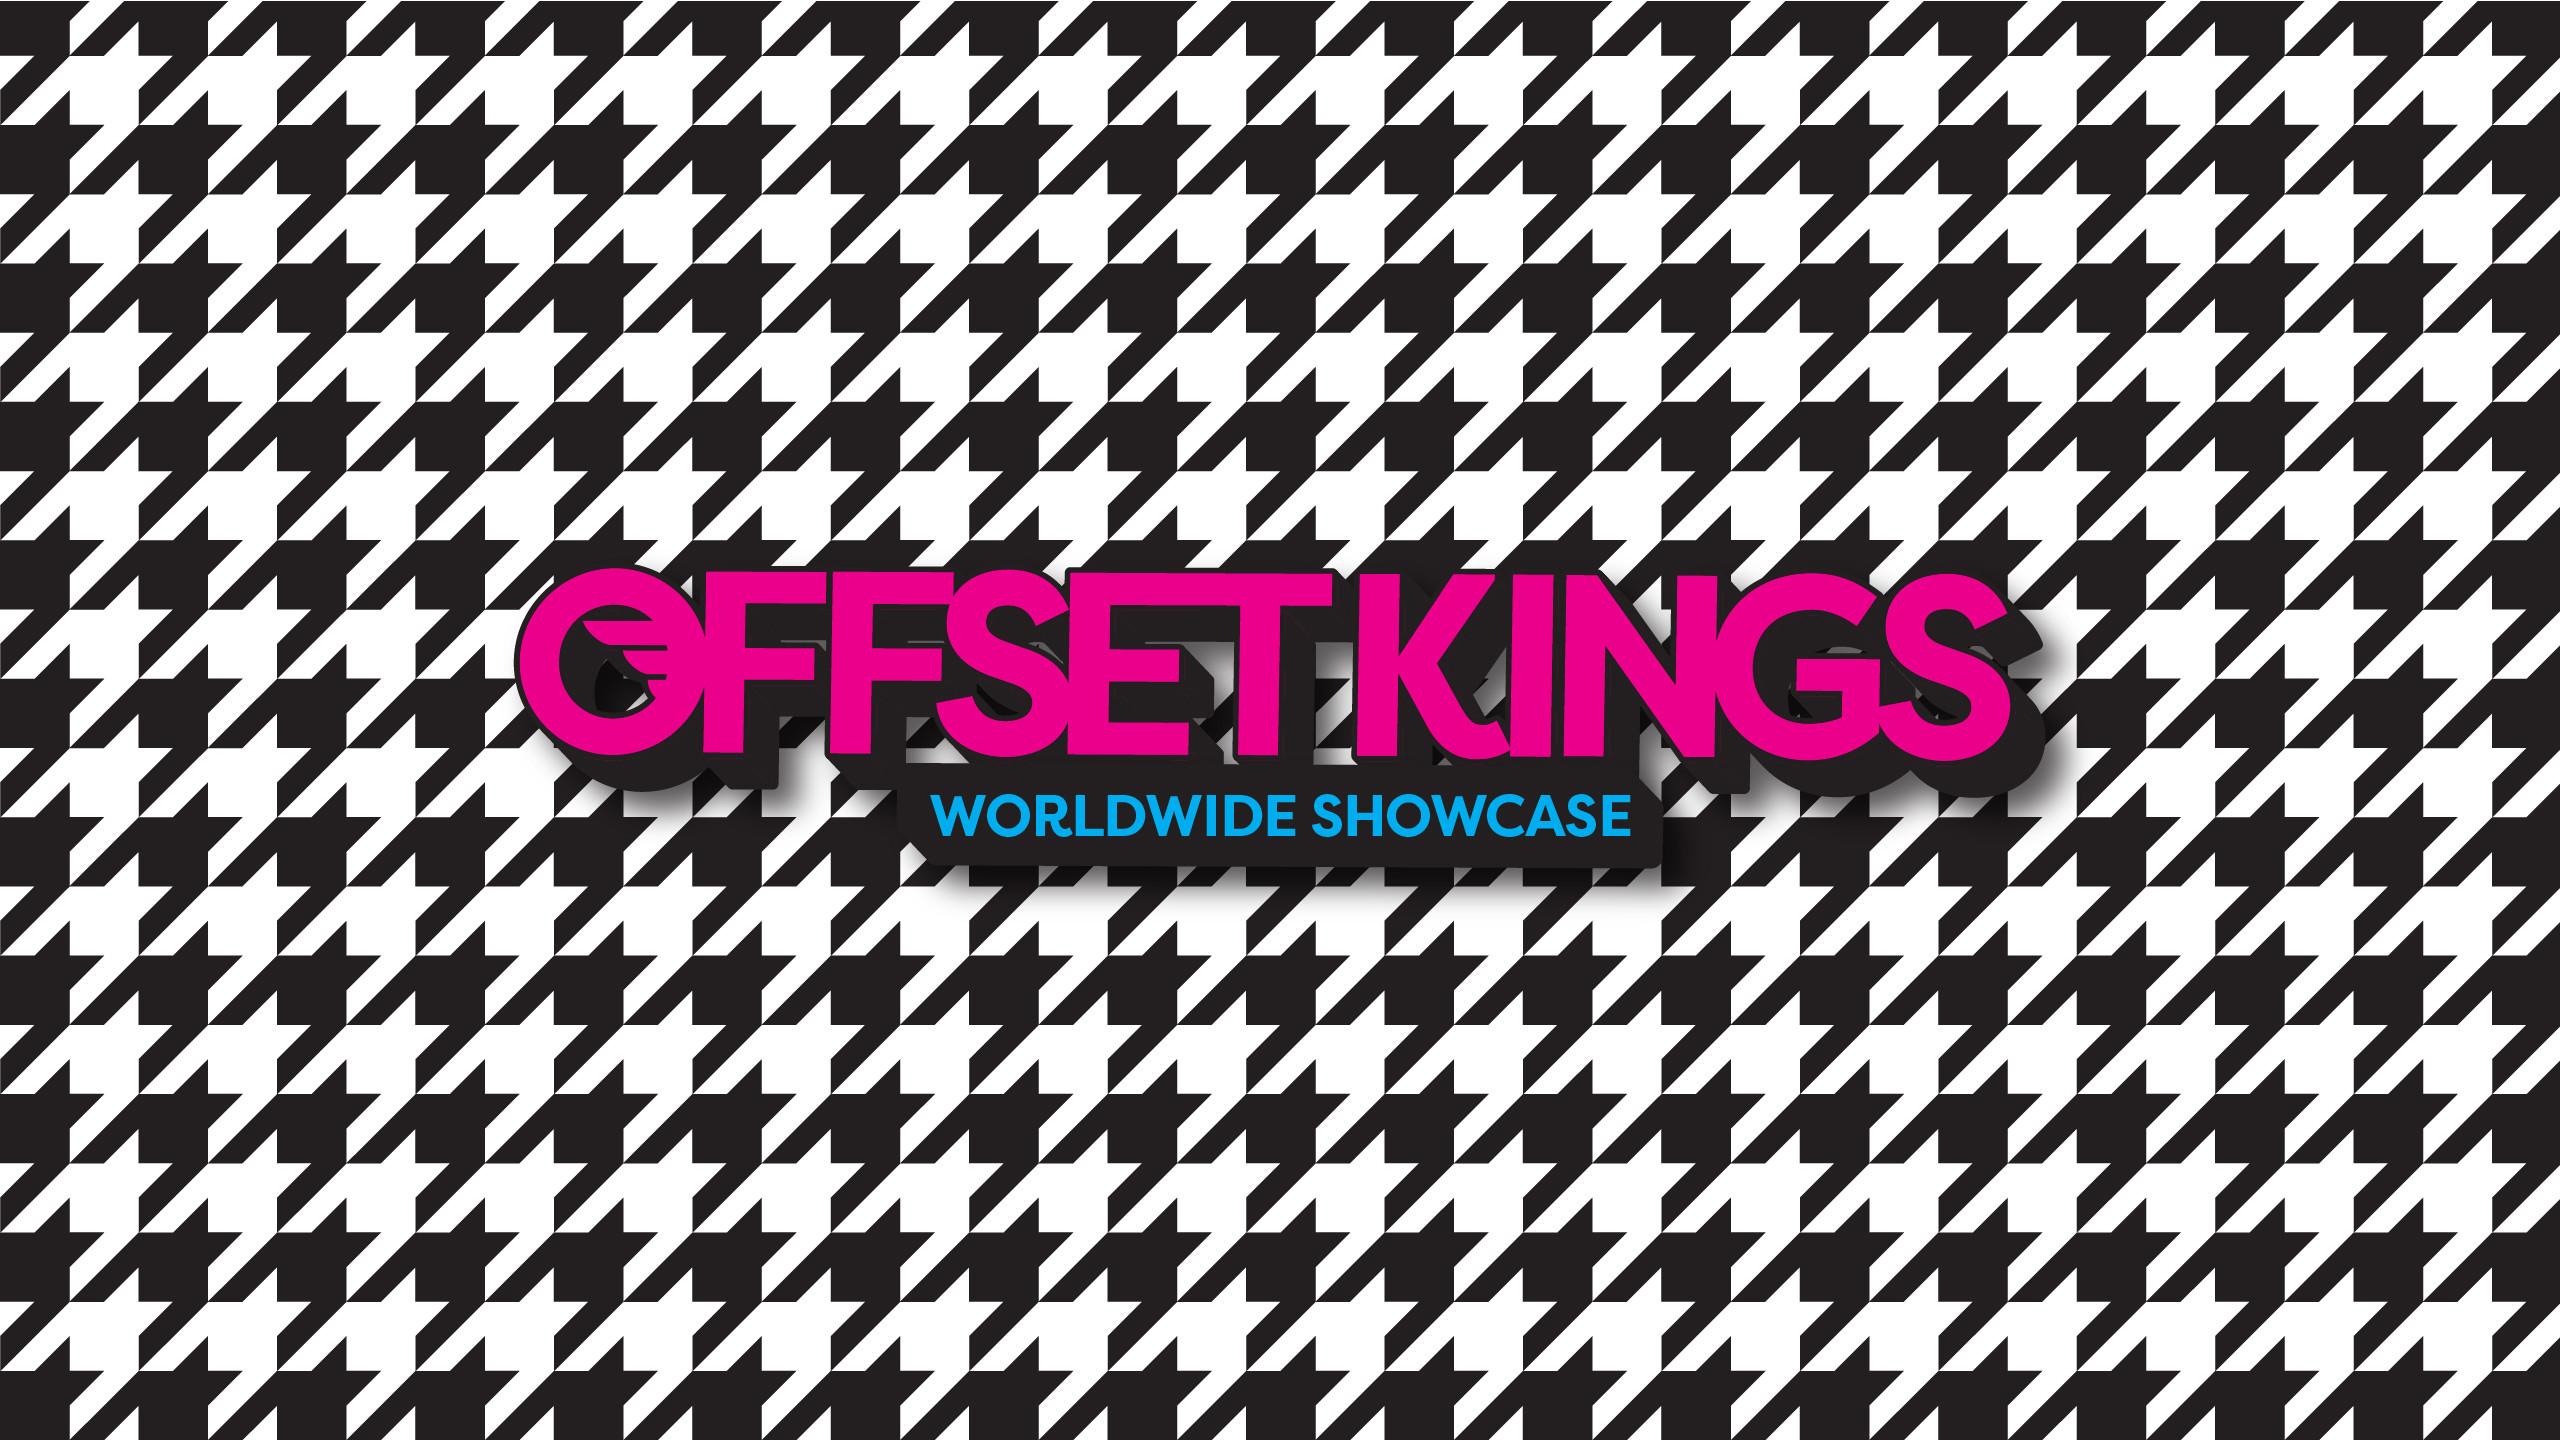 Wallpaper Wednesday: Offset Kings Throwback